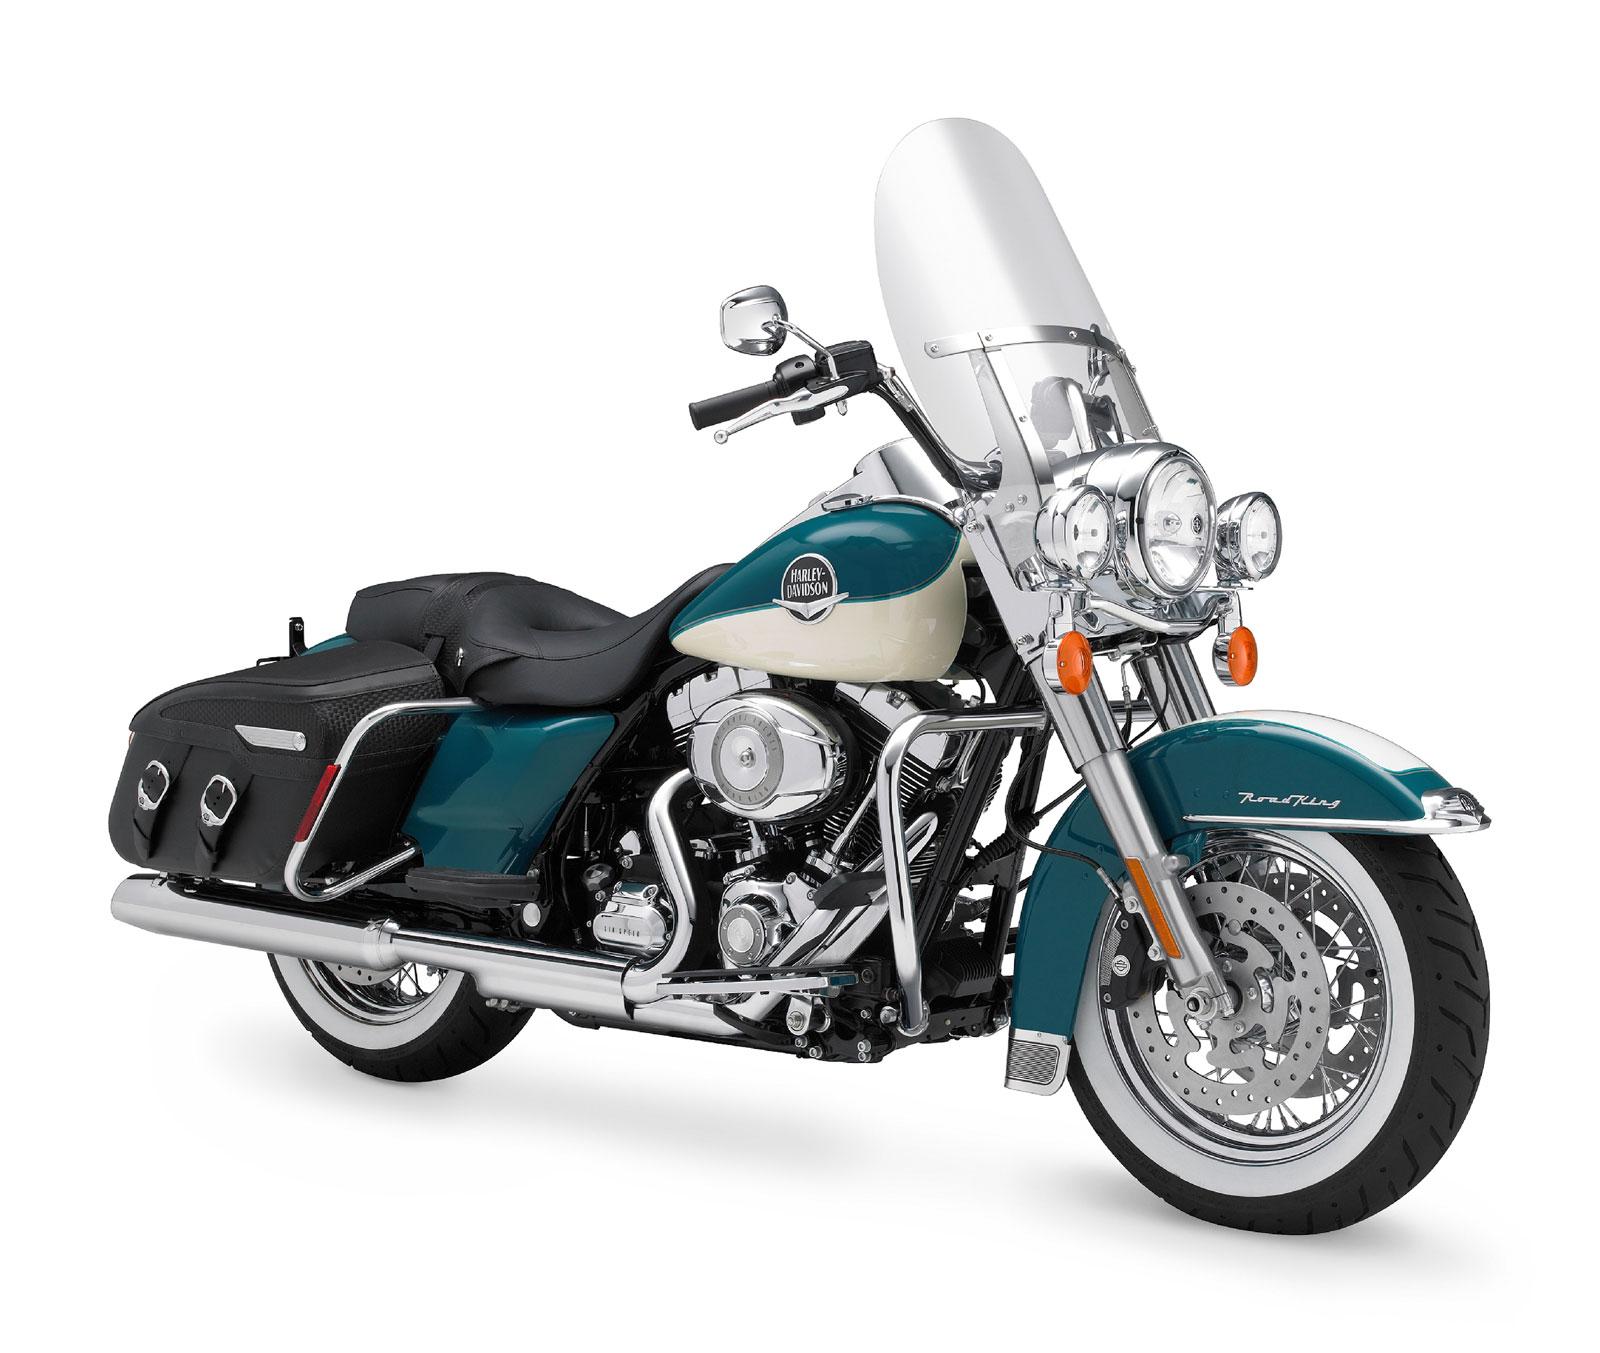 2009 Harley Davidson Flhrc Road King Classic F Wallpaper 1600x1353 89605 Wallpaperup